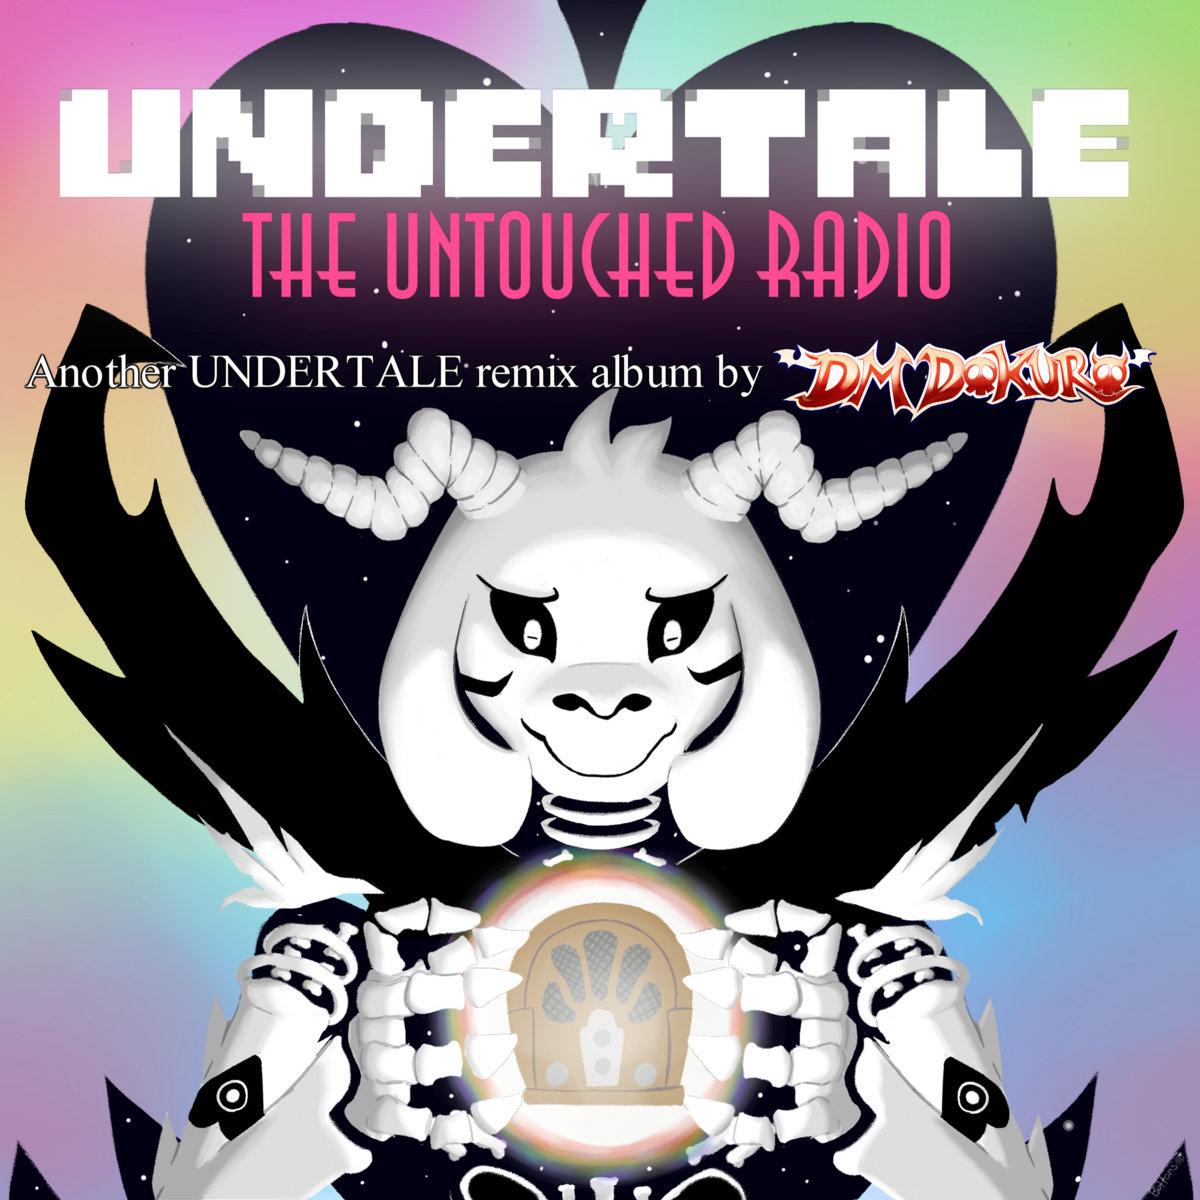 undertale the untouched radio dm dokuro